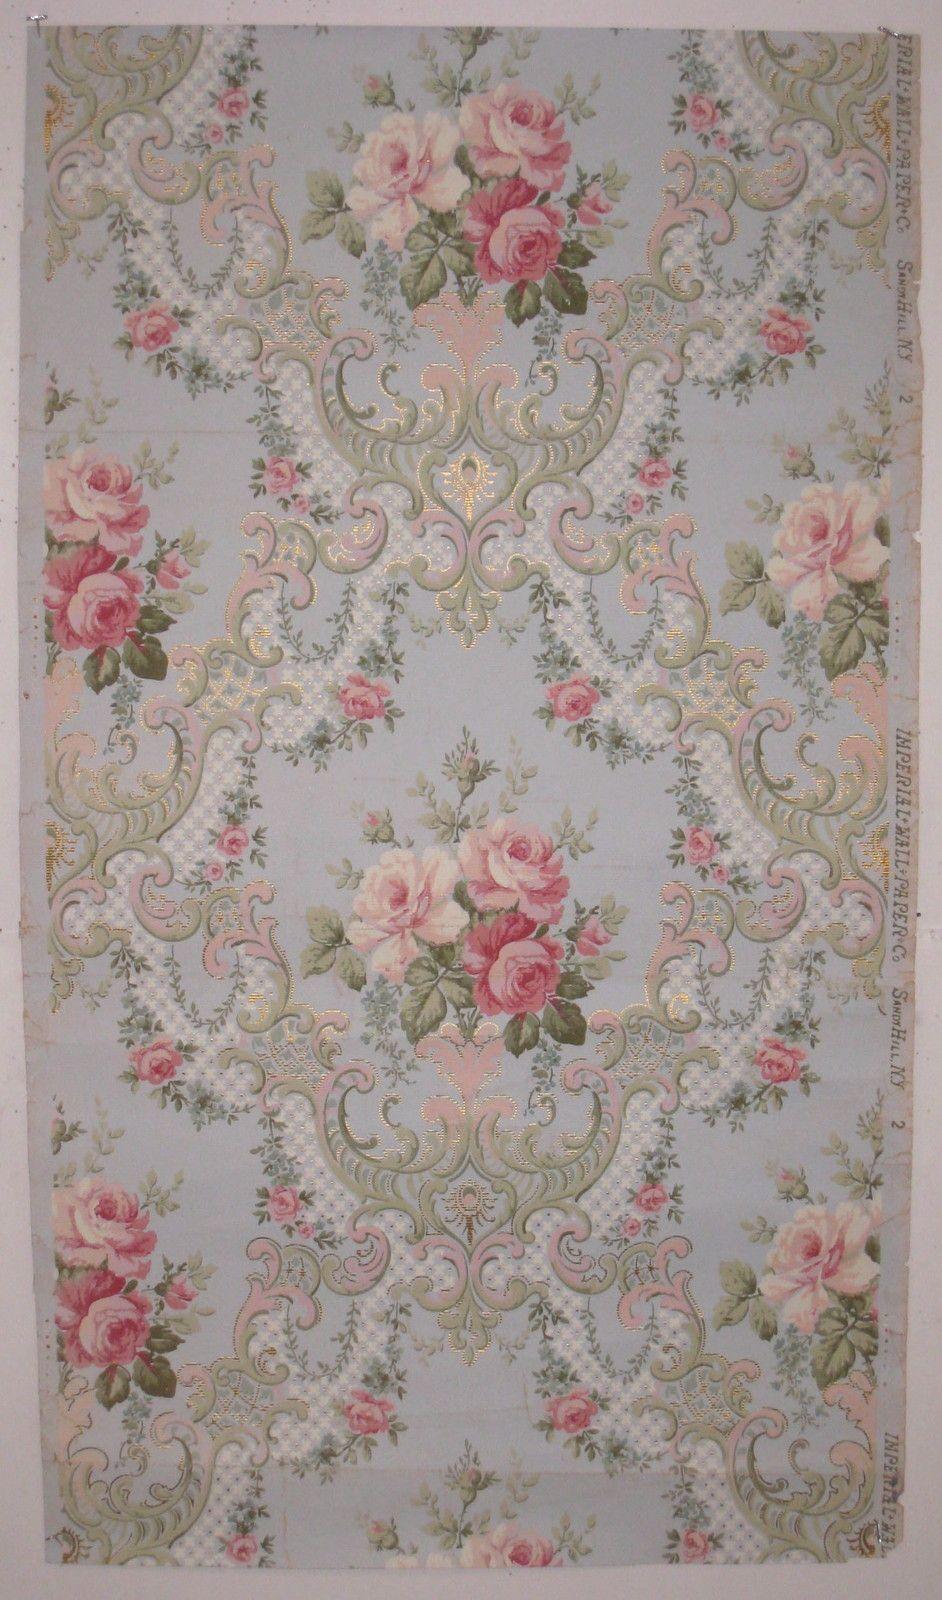 Beautiful Antique Century Furniture Dining Room Table And: Beautiful Antique 19th Century American Floral Wallpaper